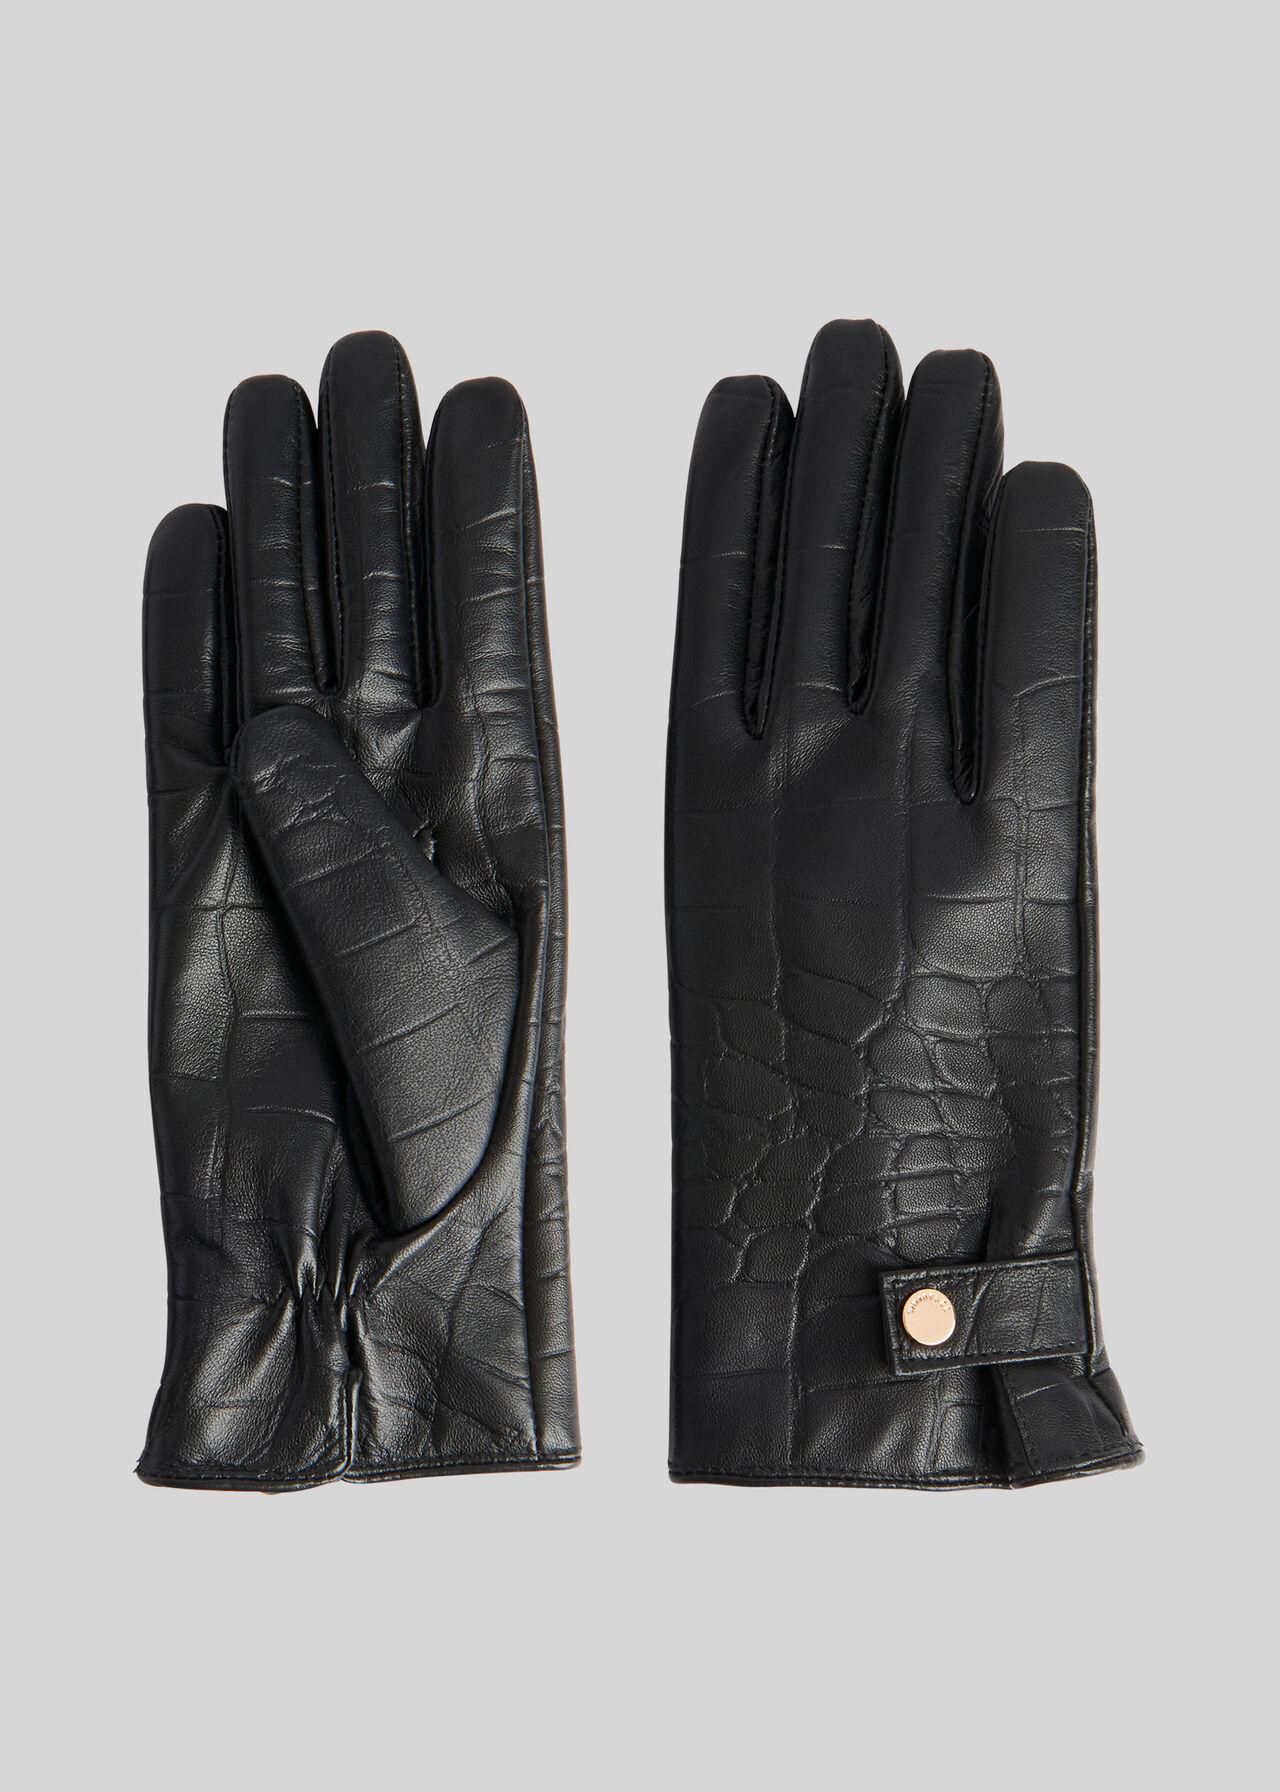 Croc Leather Glove Black